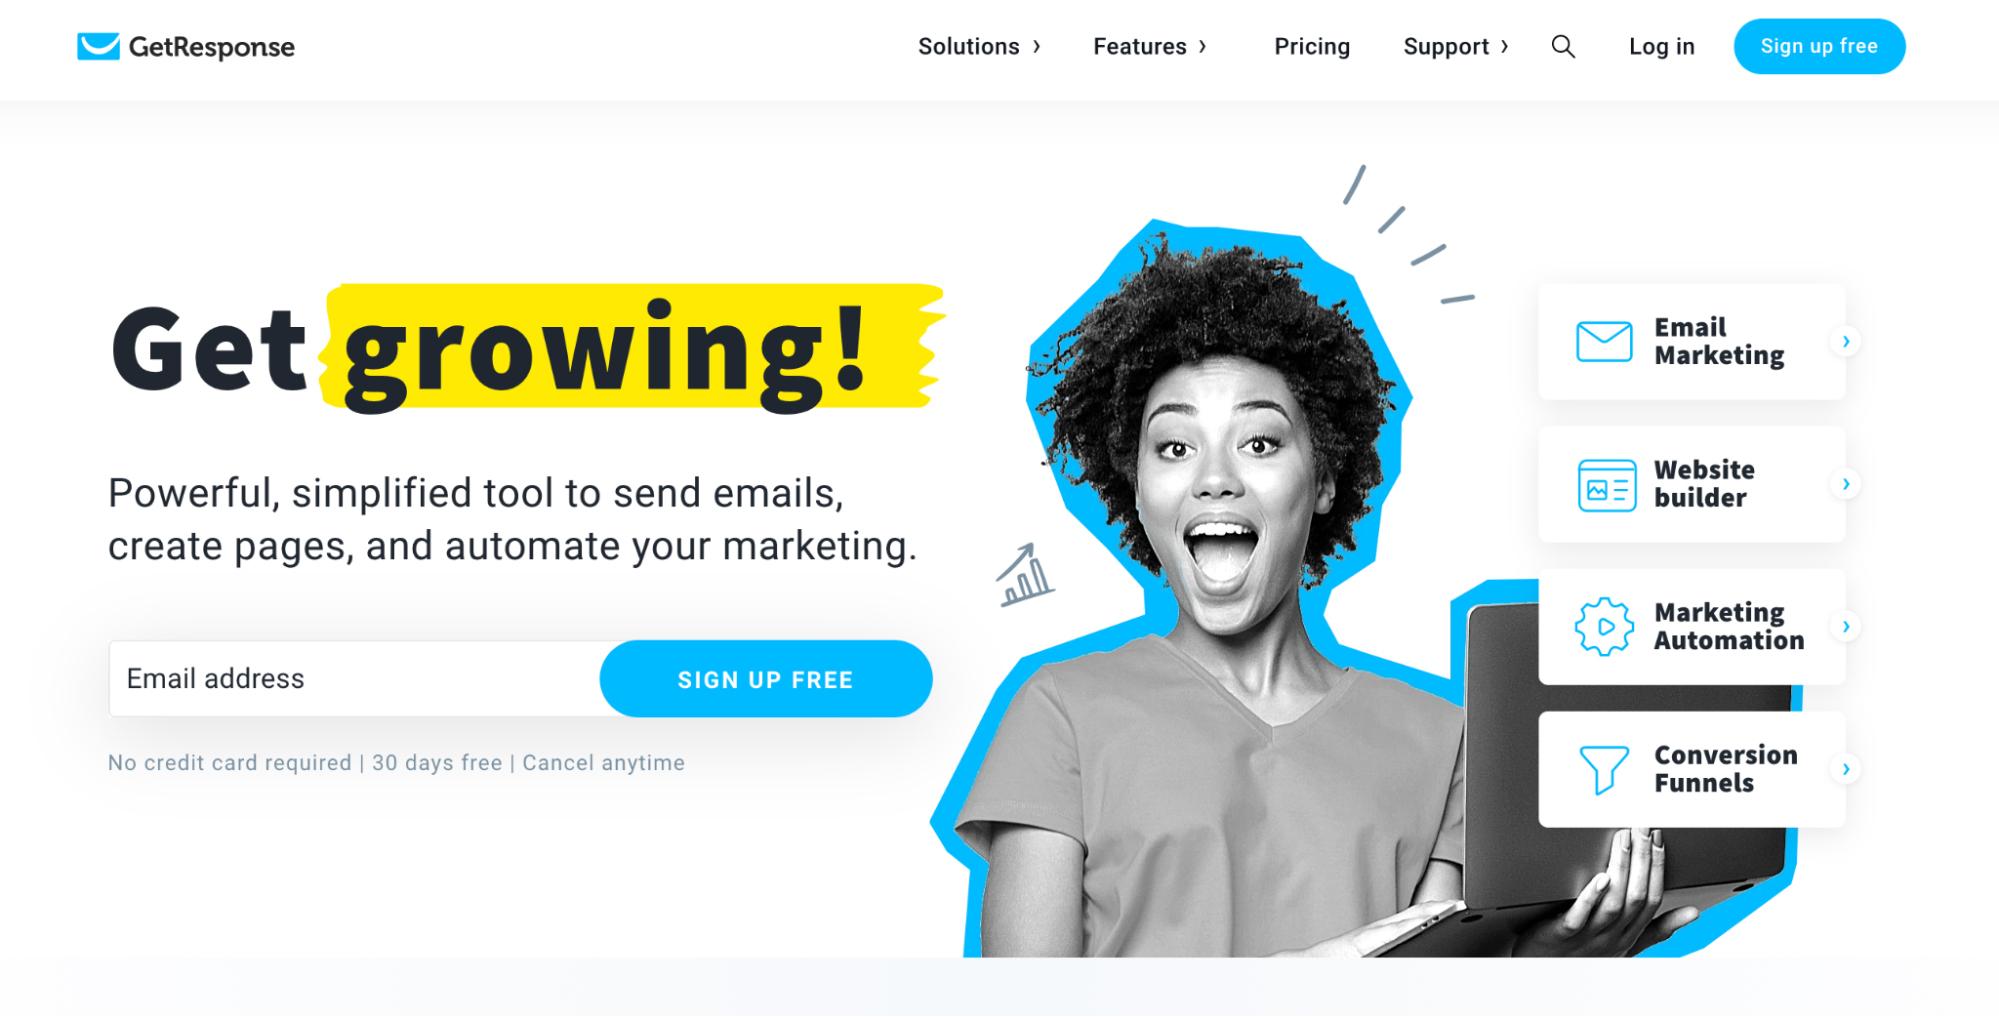 Mailchimp Alternatives: GetResponse Screenshot